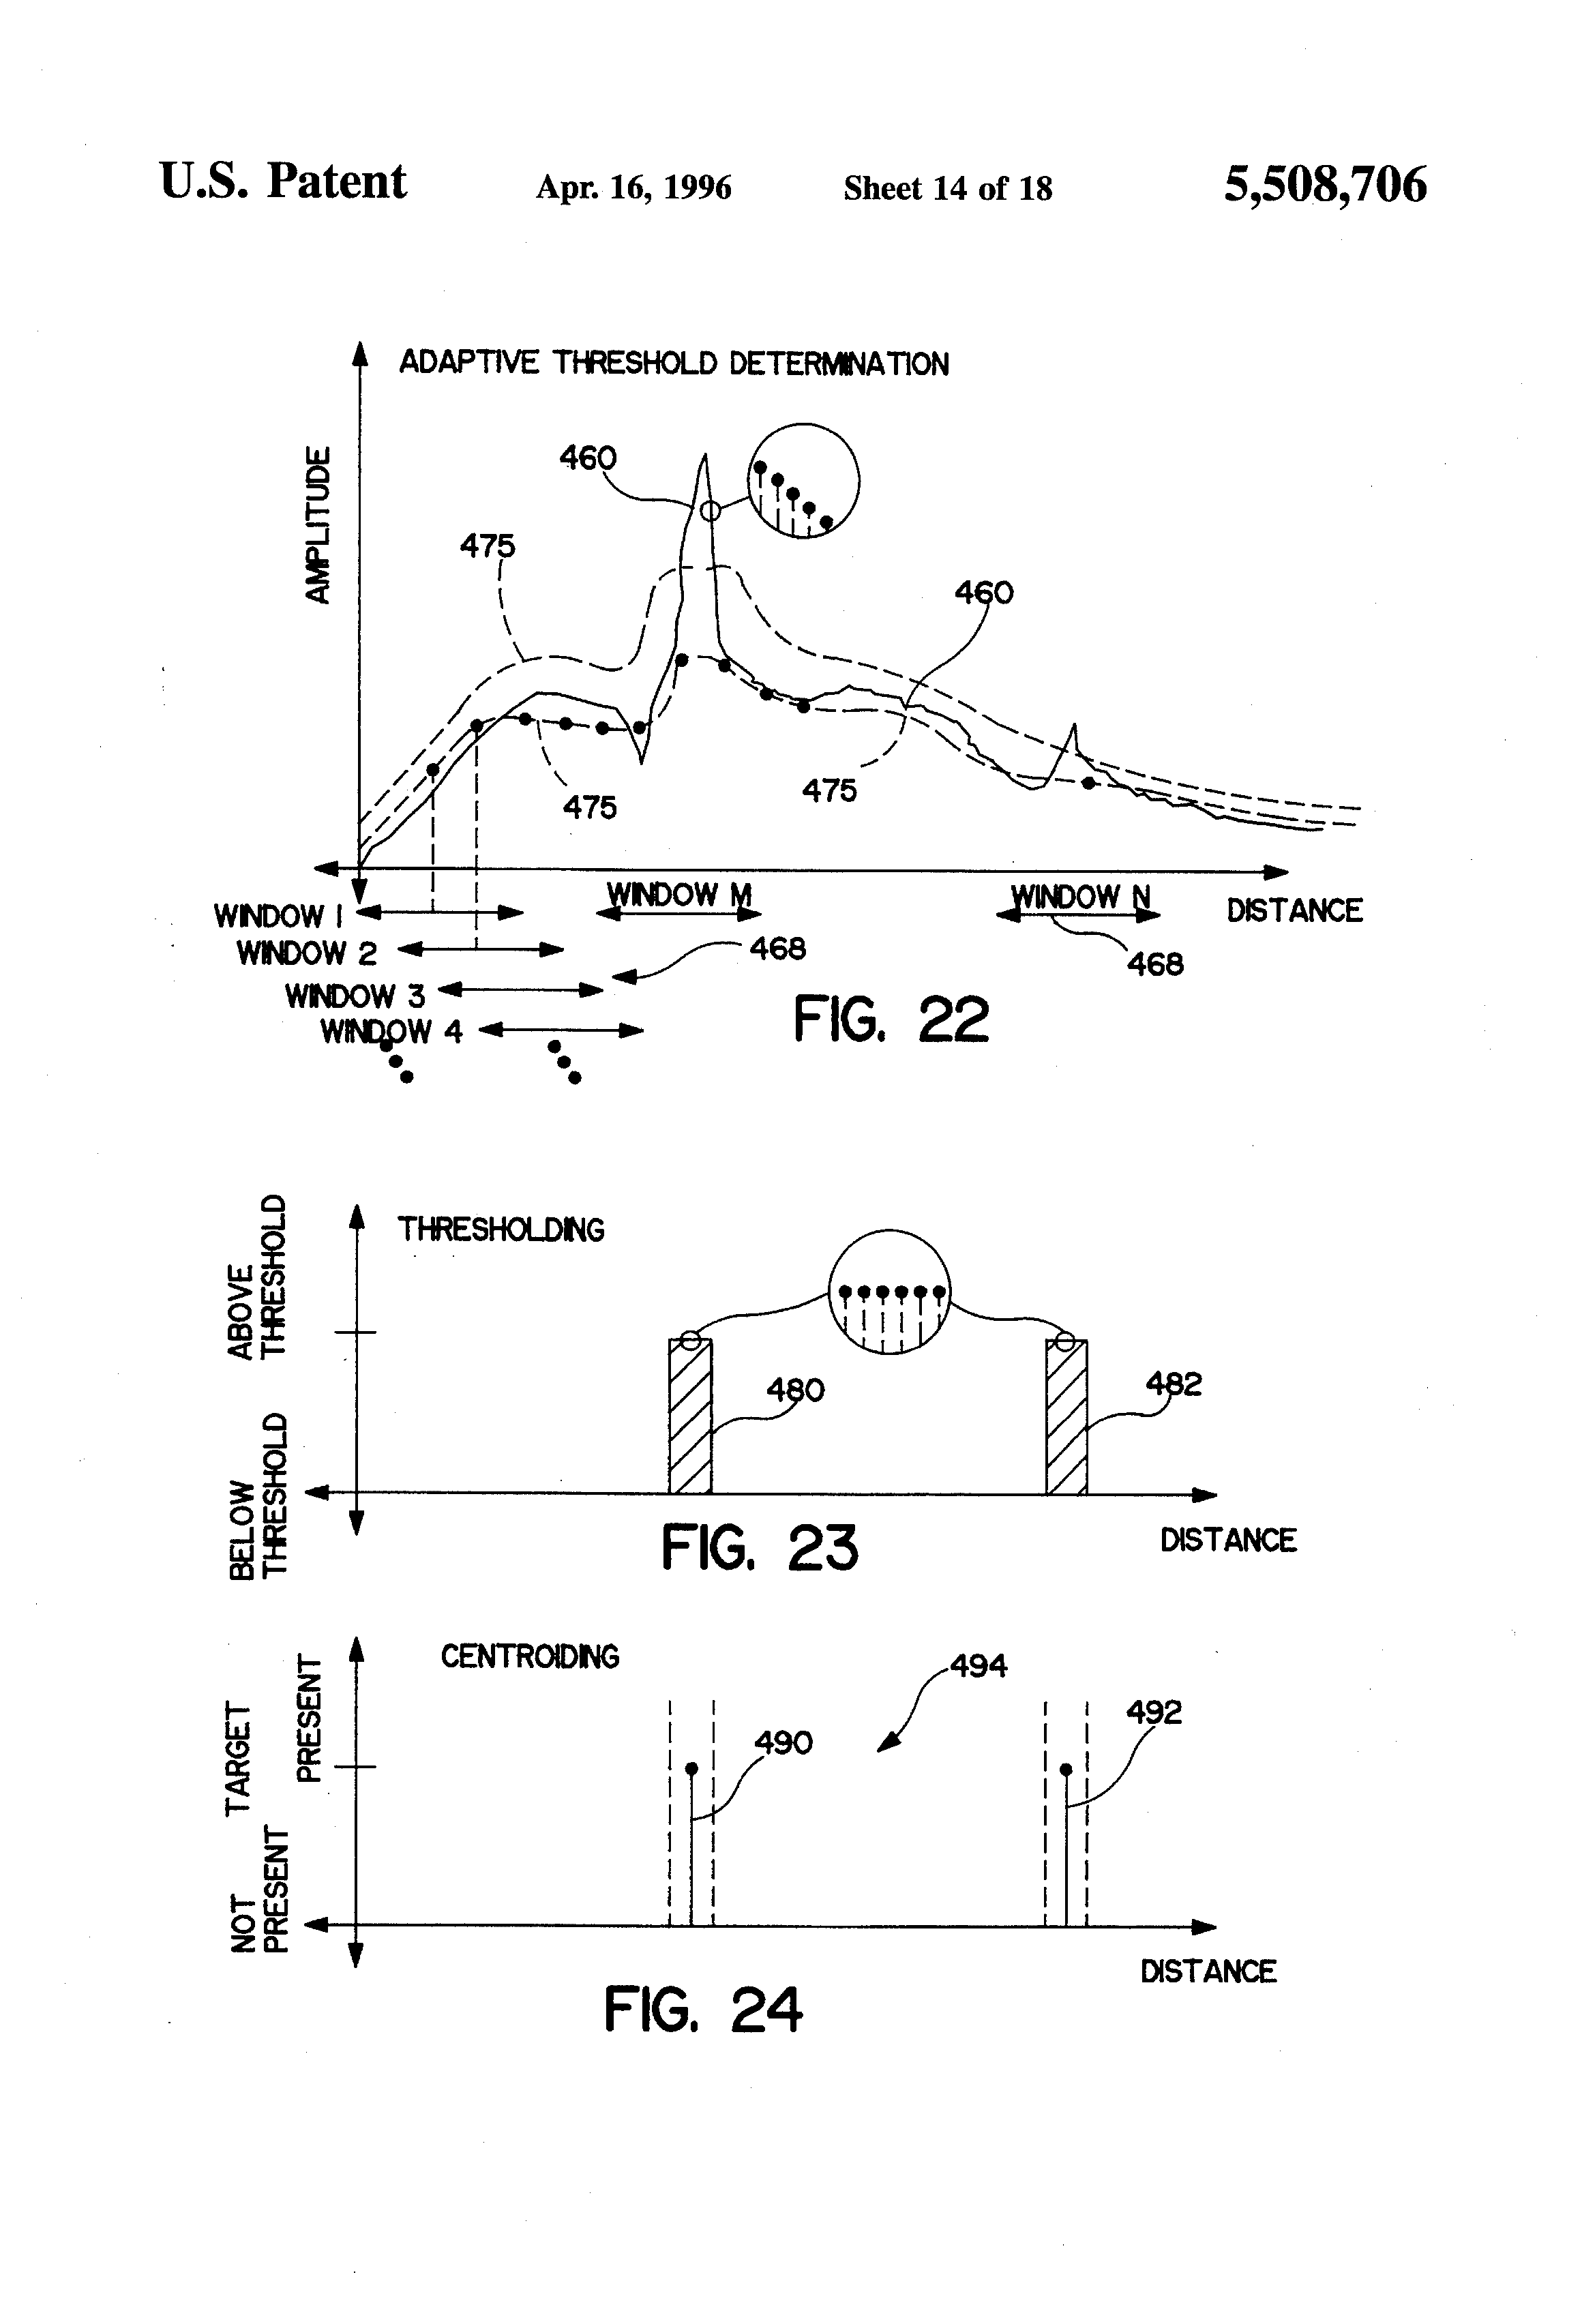 radar signal processing • purdy, blankenship, muehe, stern, rader, and williamson radar signal processing 298 lincoln laboratory journal volume 12, number 2, 2000 figure 1.